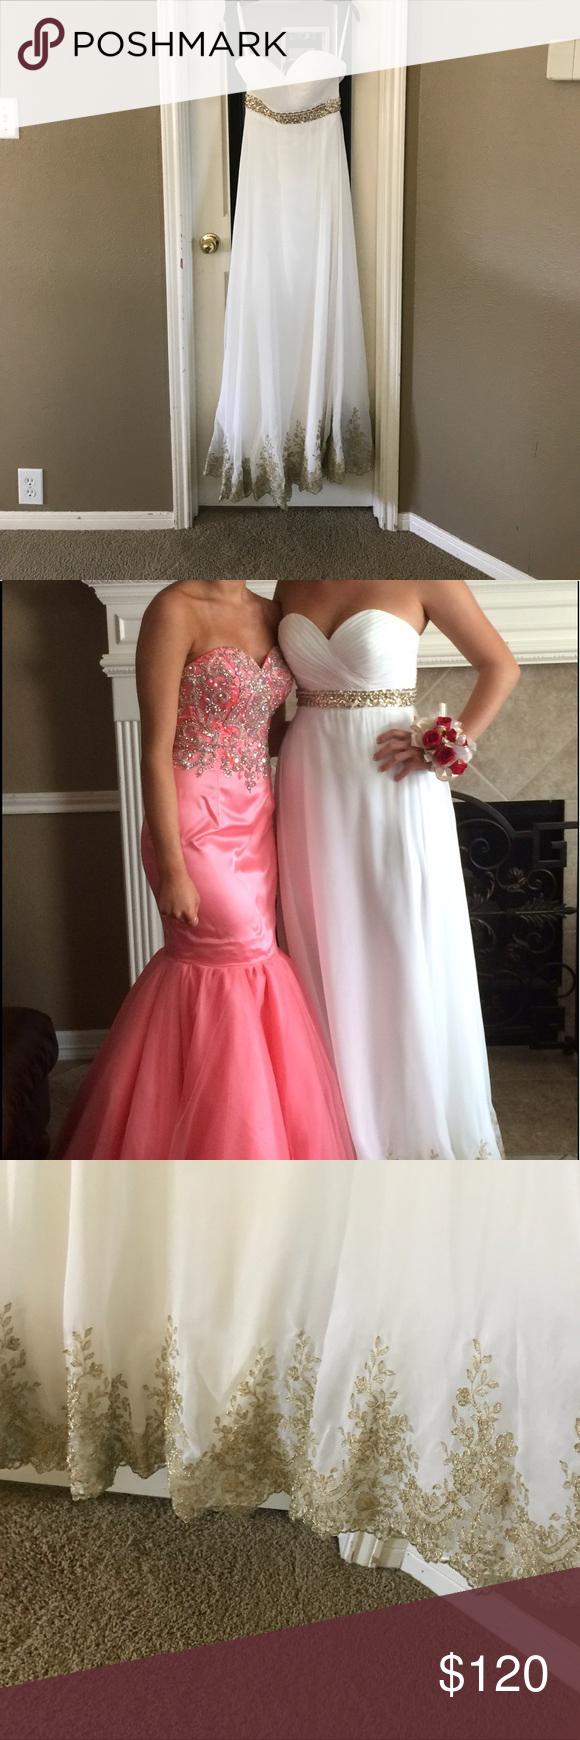 White u gold prom dress